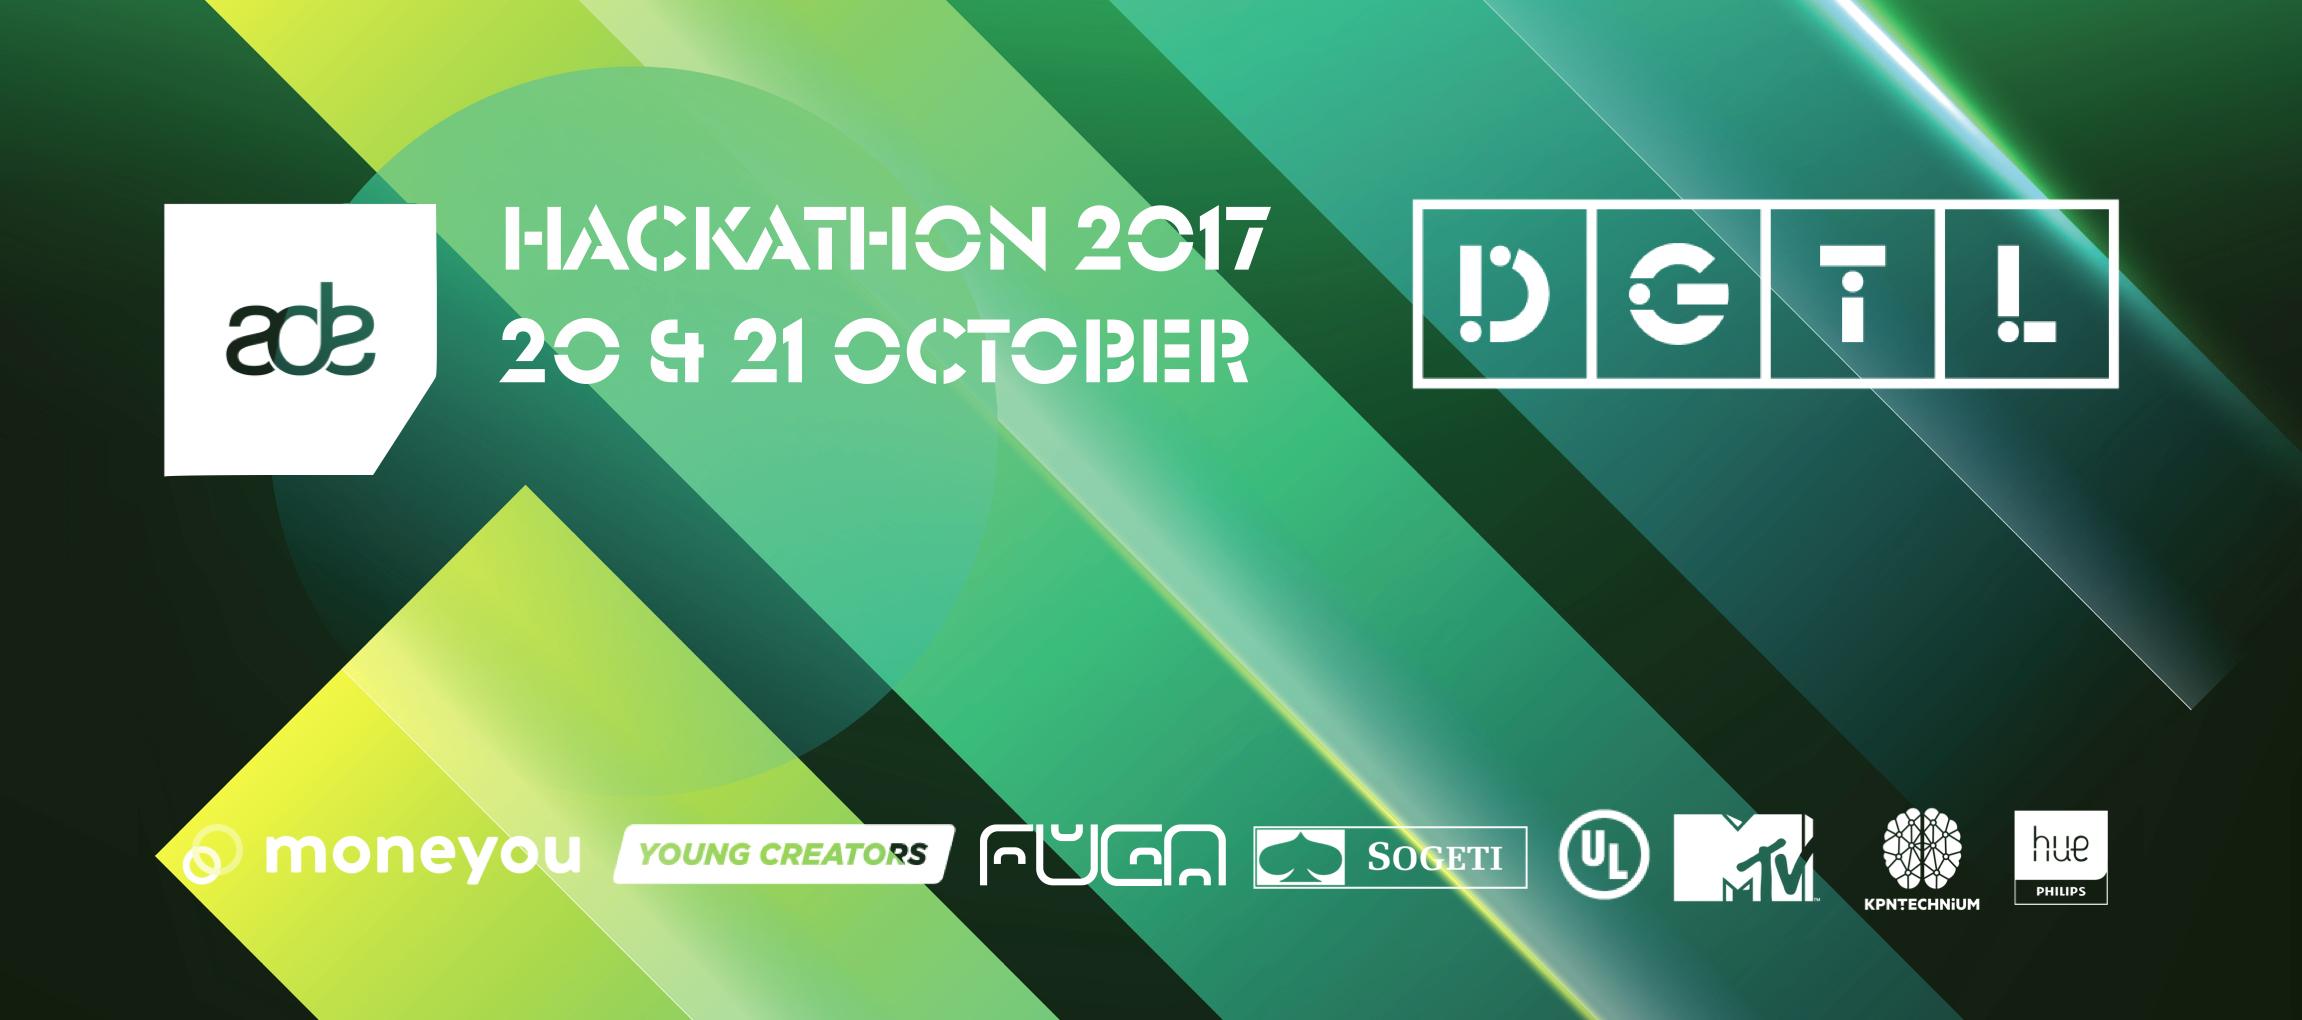 ADE Hackathon - banner.jpg